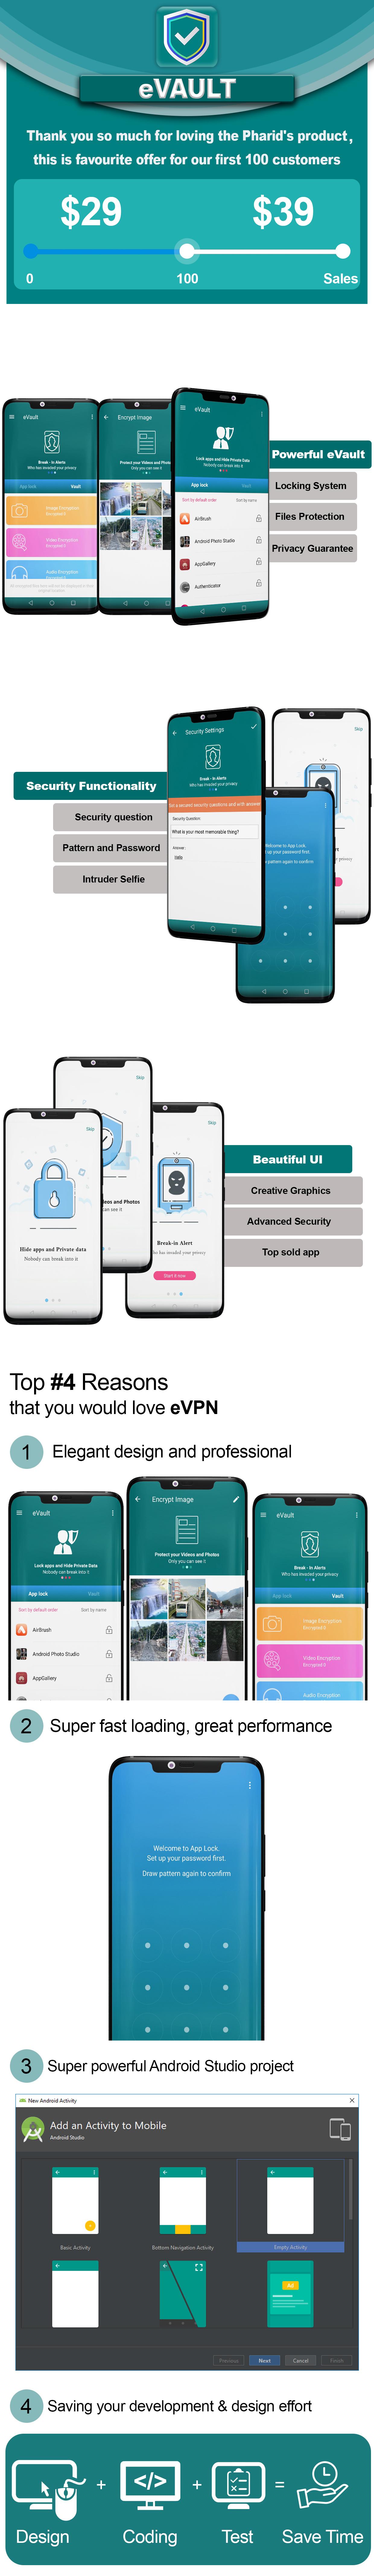 eVault - Hide Pics, Videos with AppLocker | Beautiful UI, Ads Slider, Admob, Push Notification - 5